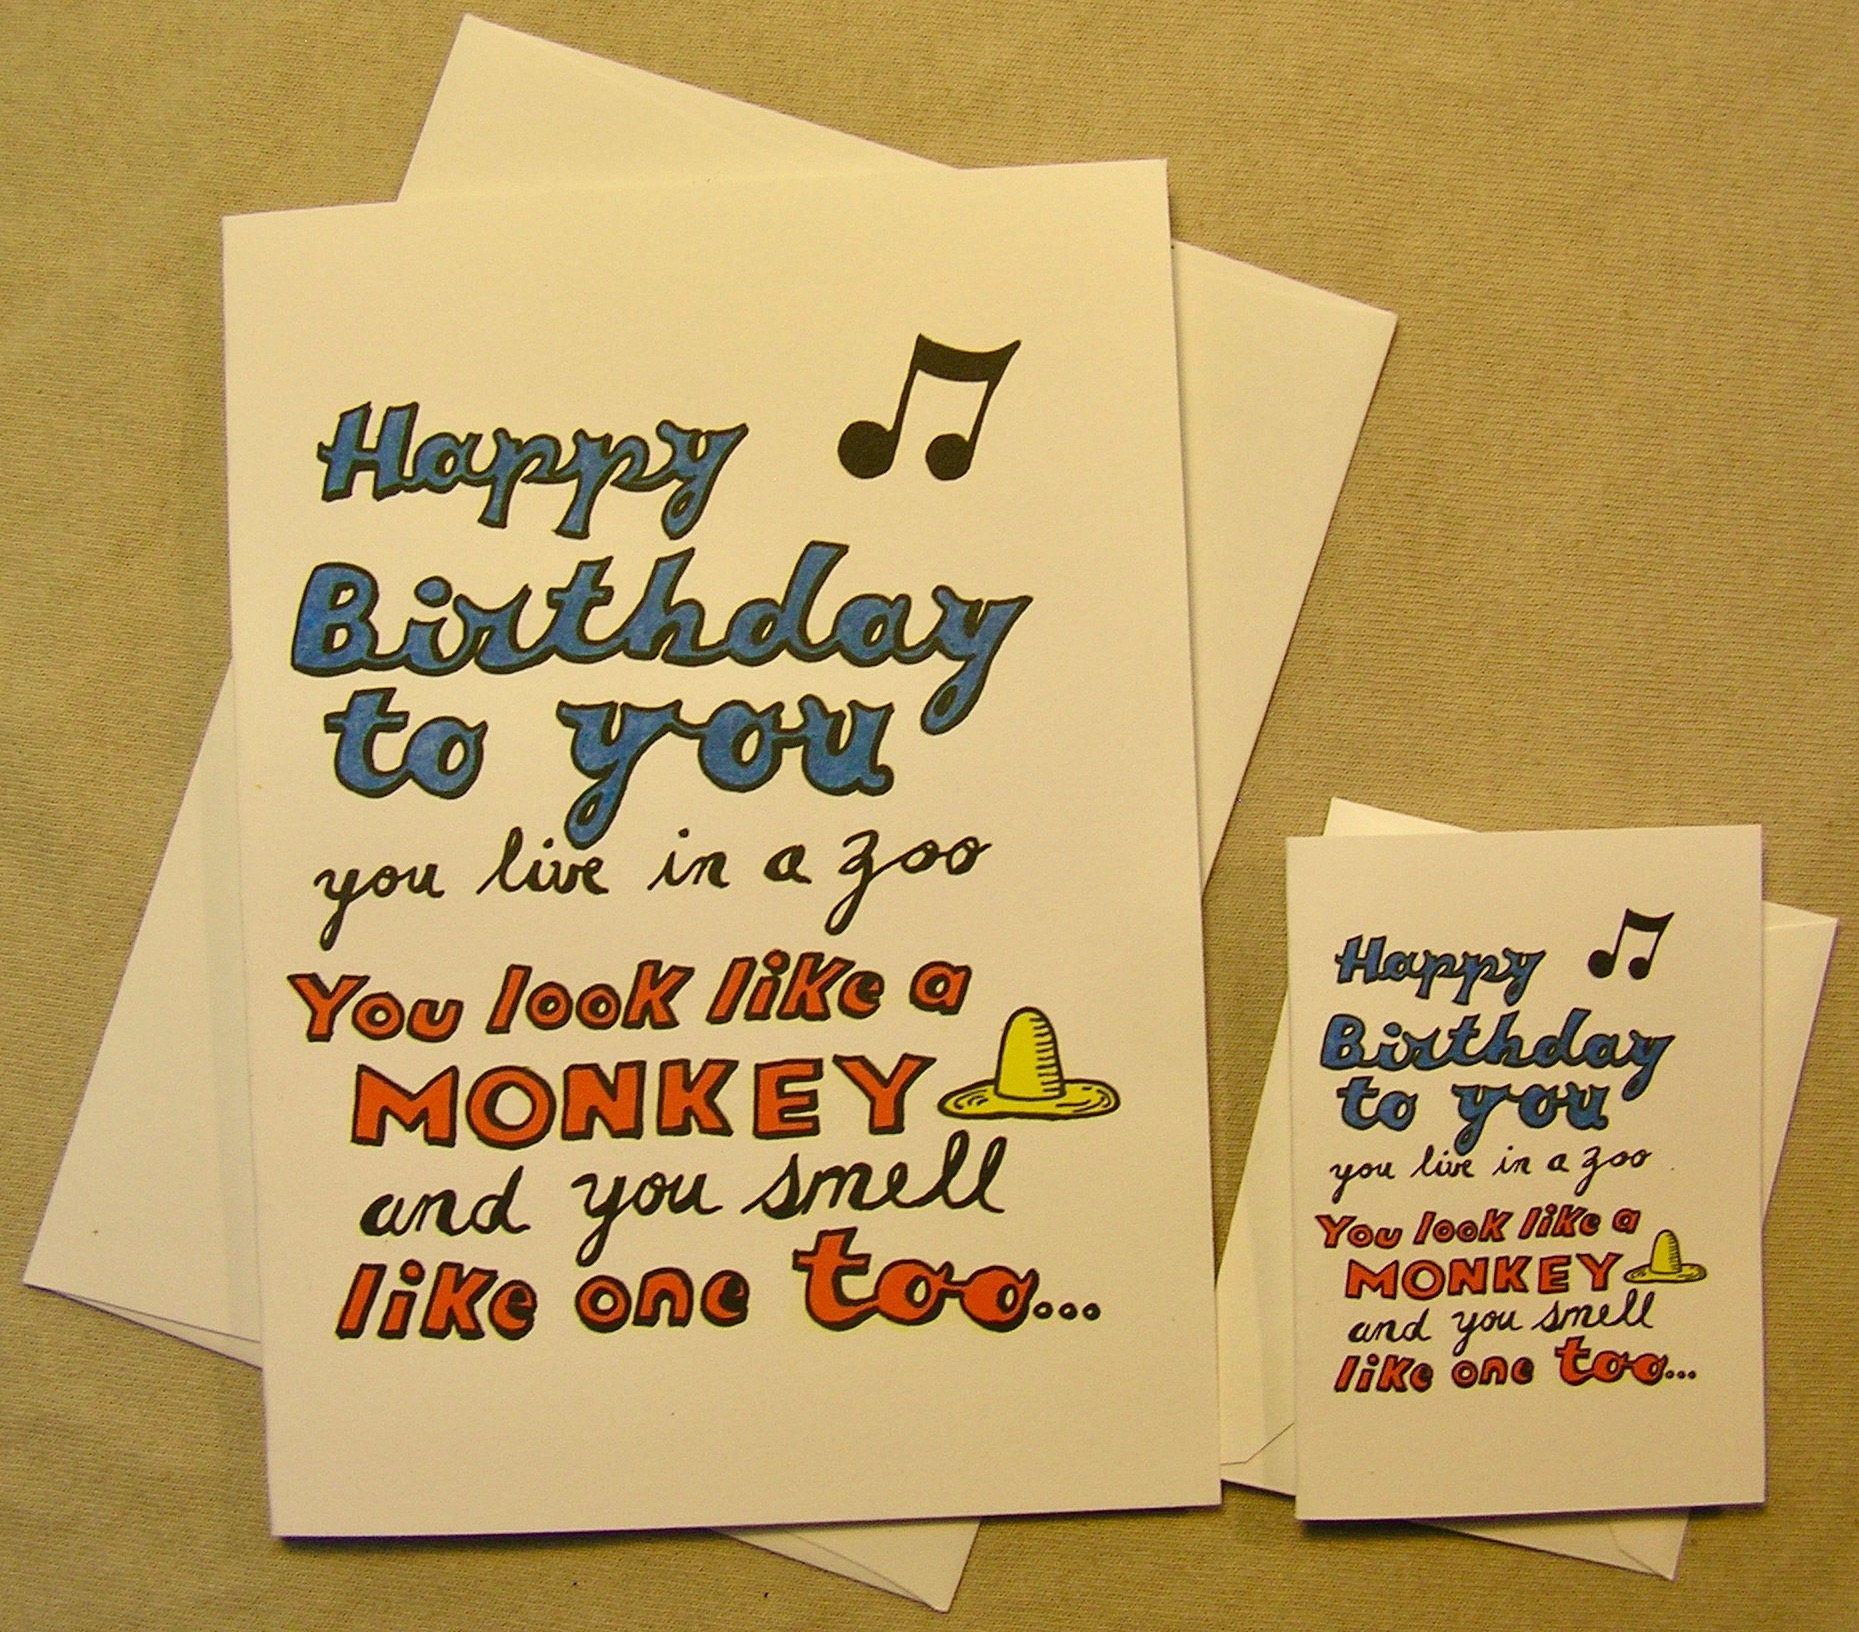 Curious george birthday card happy birthday to you you live in a curious george birthday card happy birthday to you you live in a zoo regular size and mini a lunar eclipse cartoon birthday card bookmarktalkfo Images